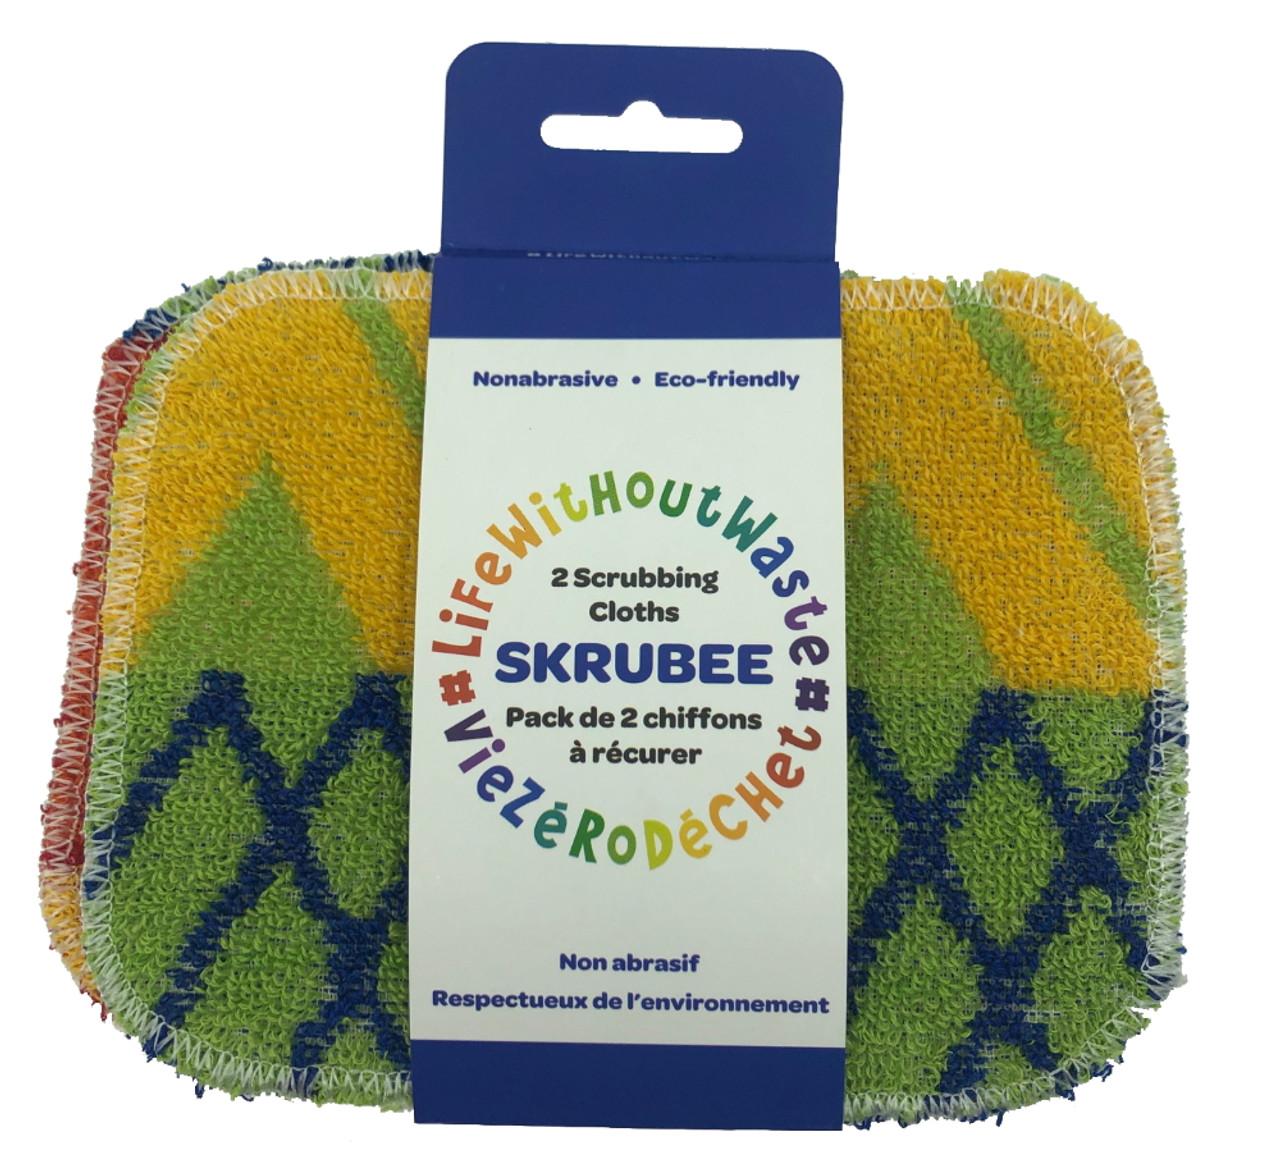 Skrubee Nonabrasive Cleaning Cloth